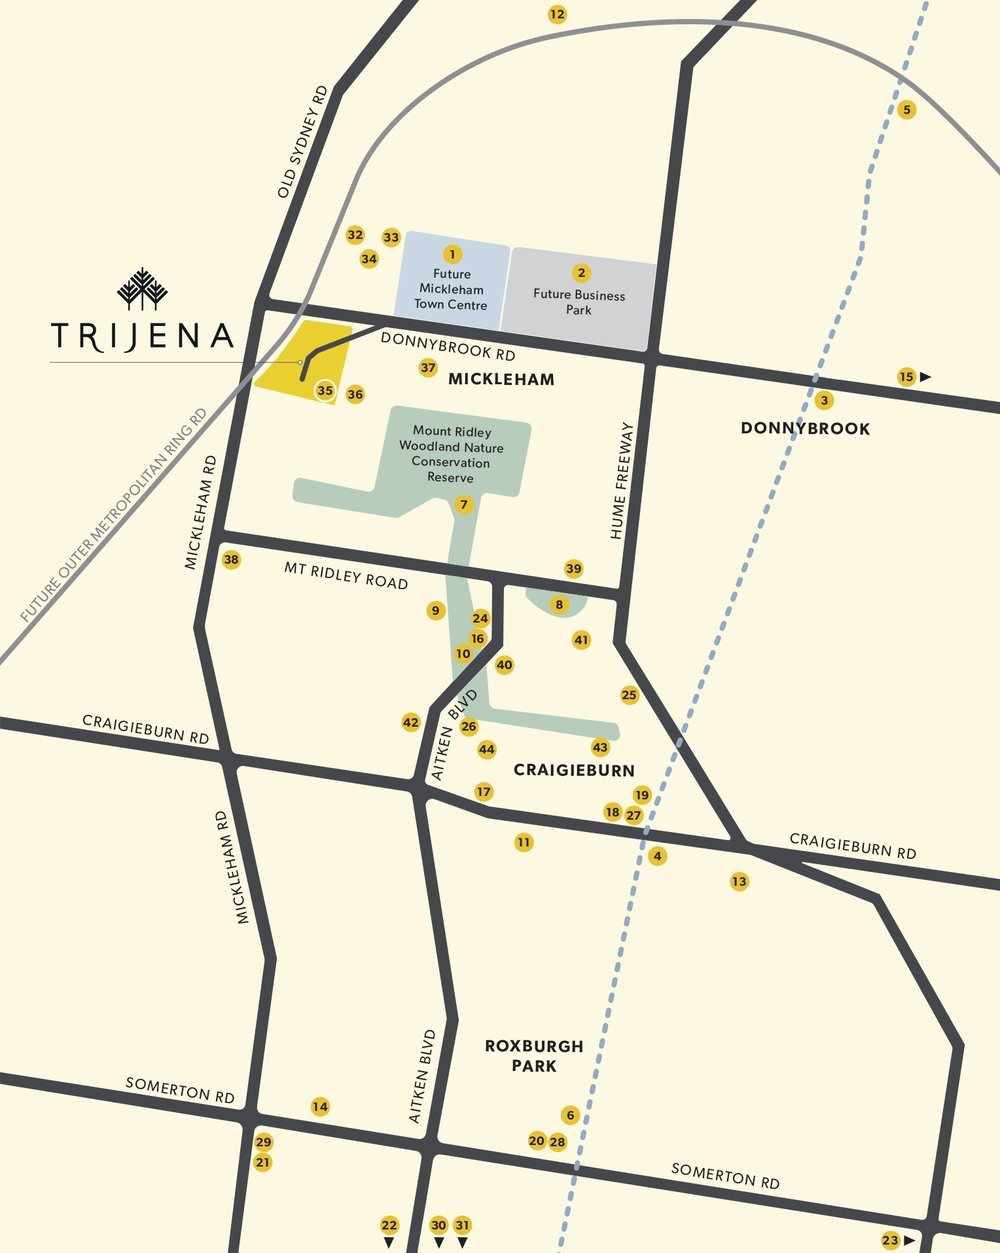 trijena-location-map.jpg